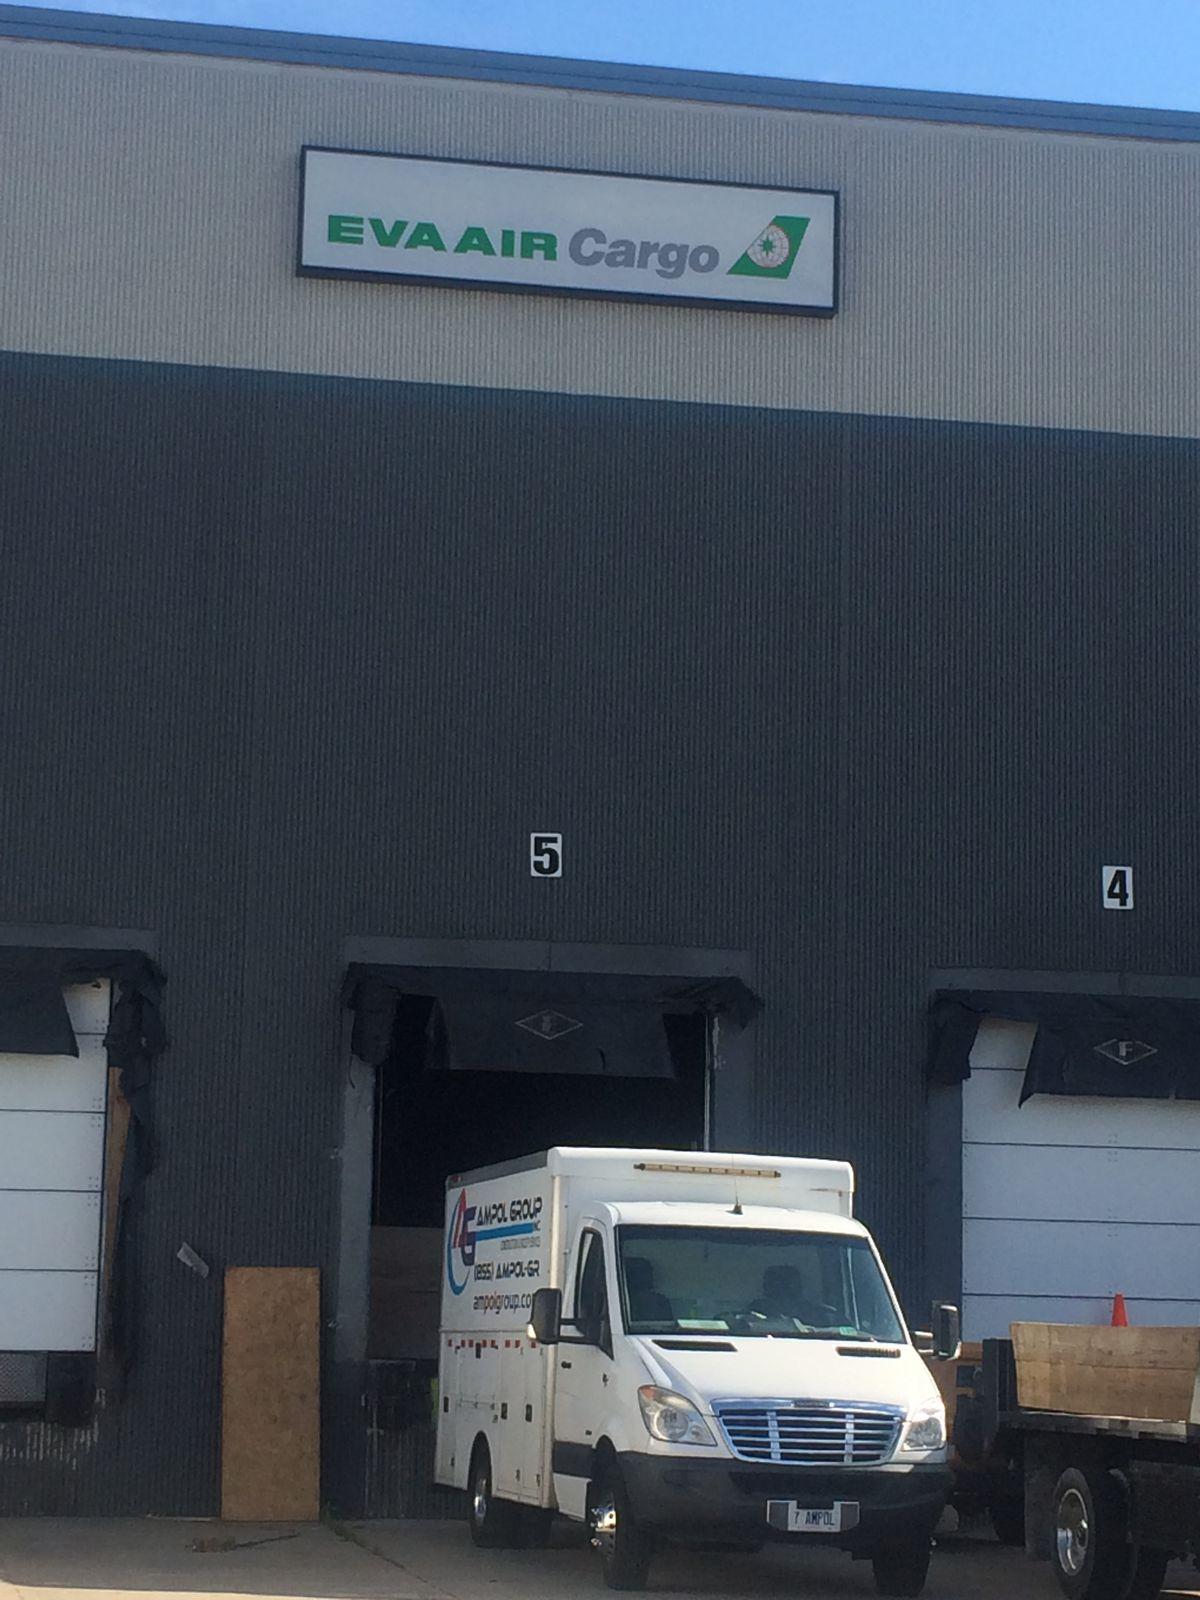 EVA Air's office in Franklin Park. | Robert Herguth / Sun-Times